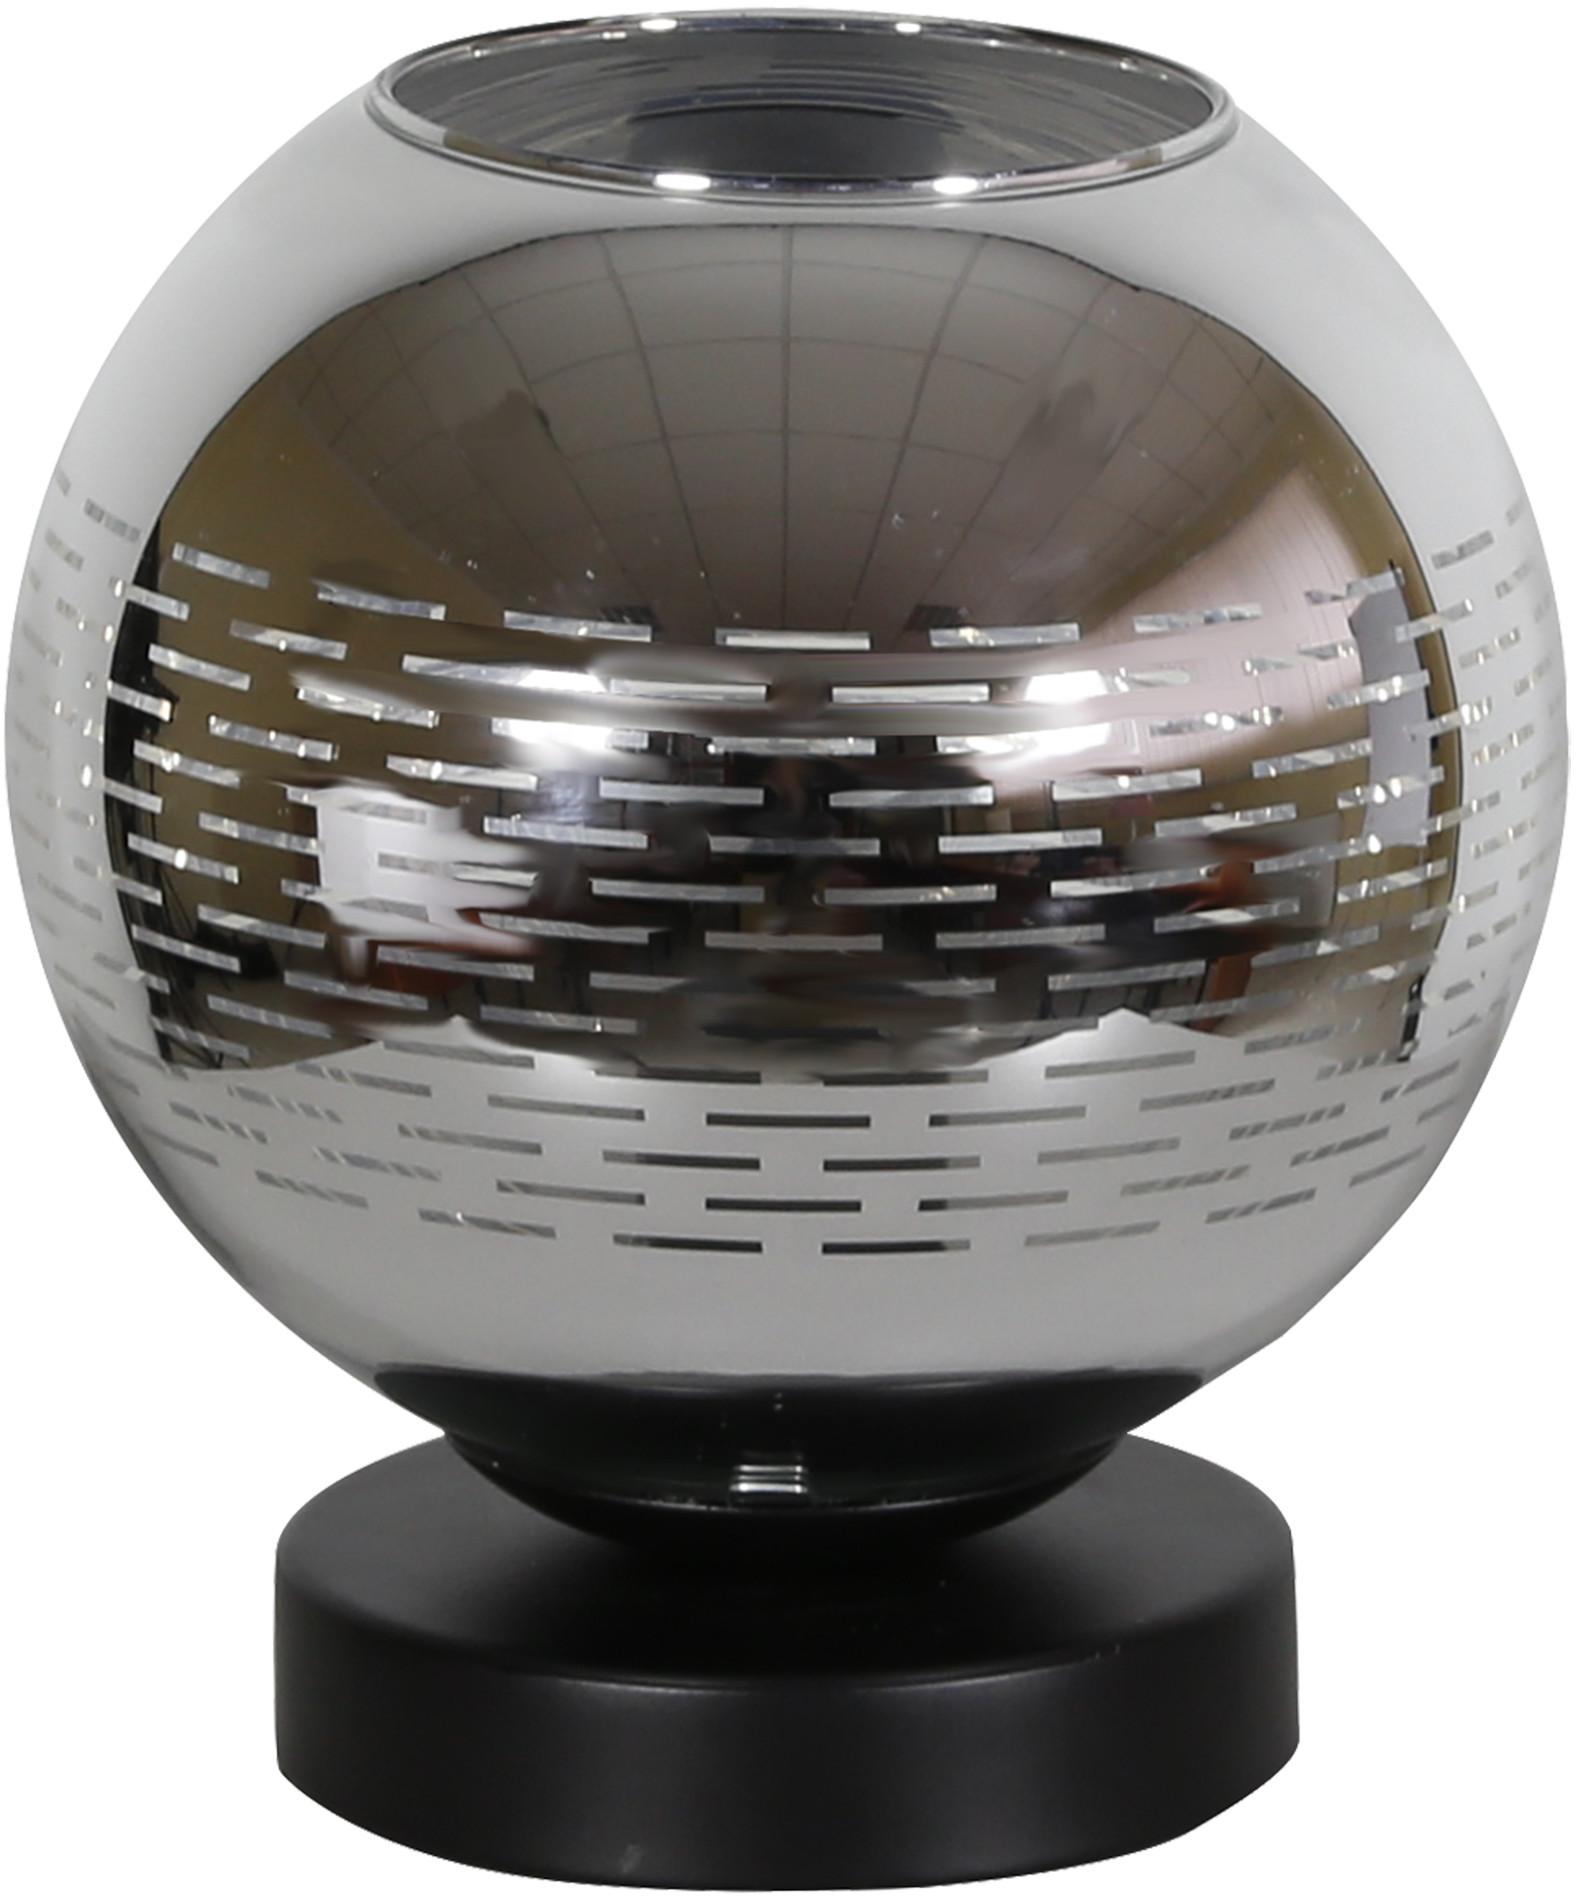 Candellux TRIO 2 LAMPA GABINETOWA 1X60W E27 CHROM 41-62871